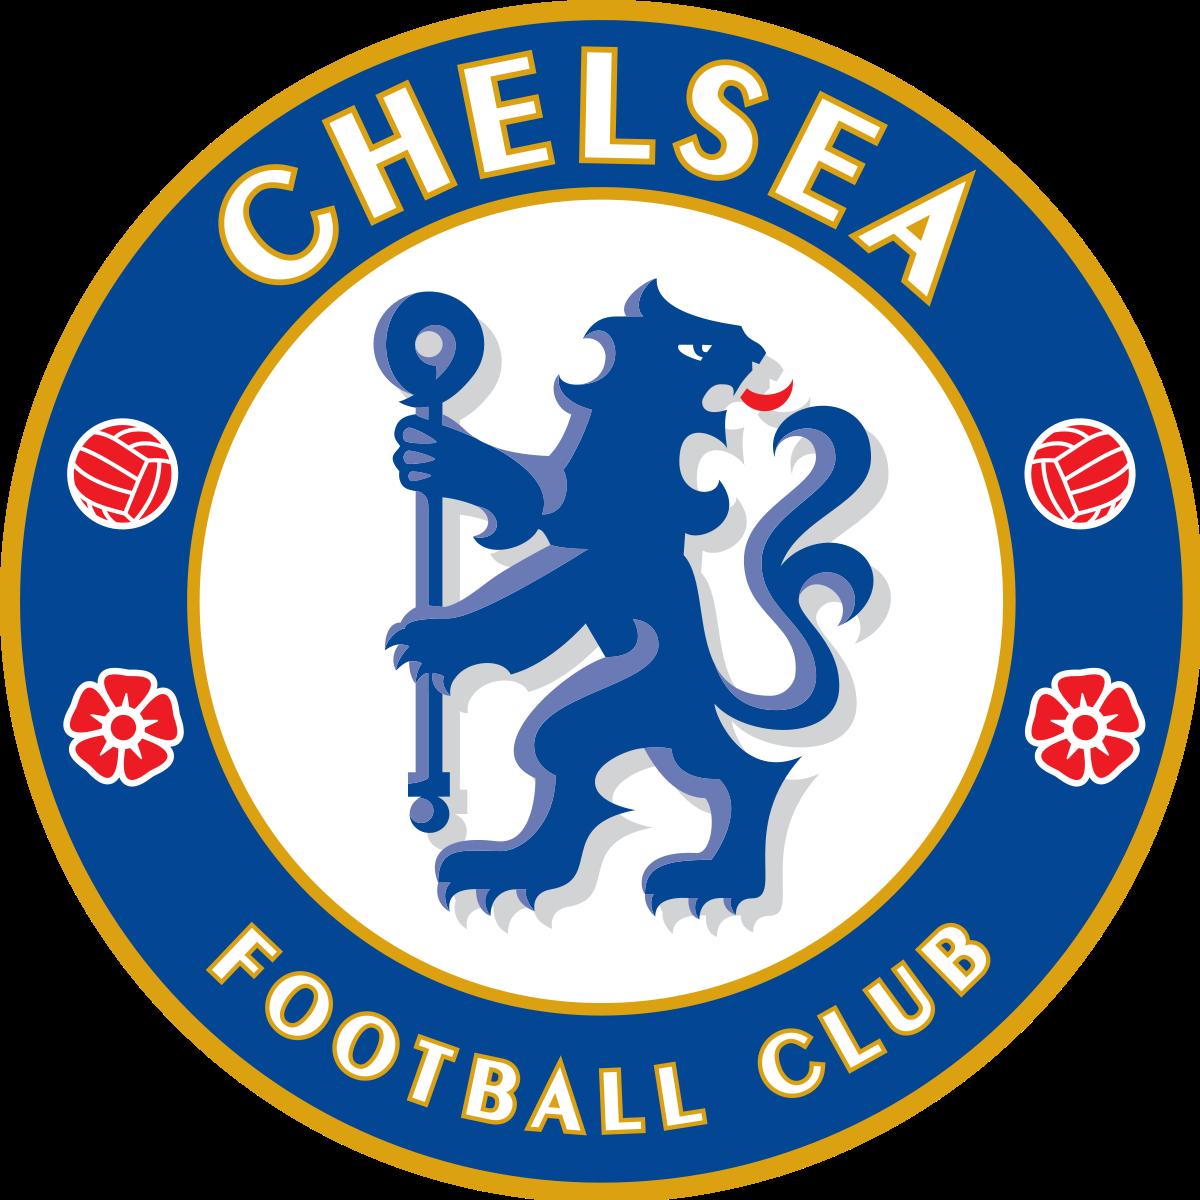 Chelsea prospect Gallagher enjoying 'great start' to loan spell